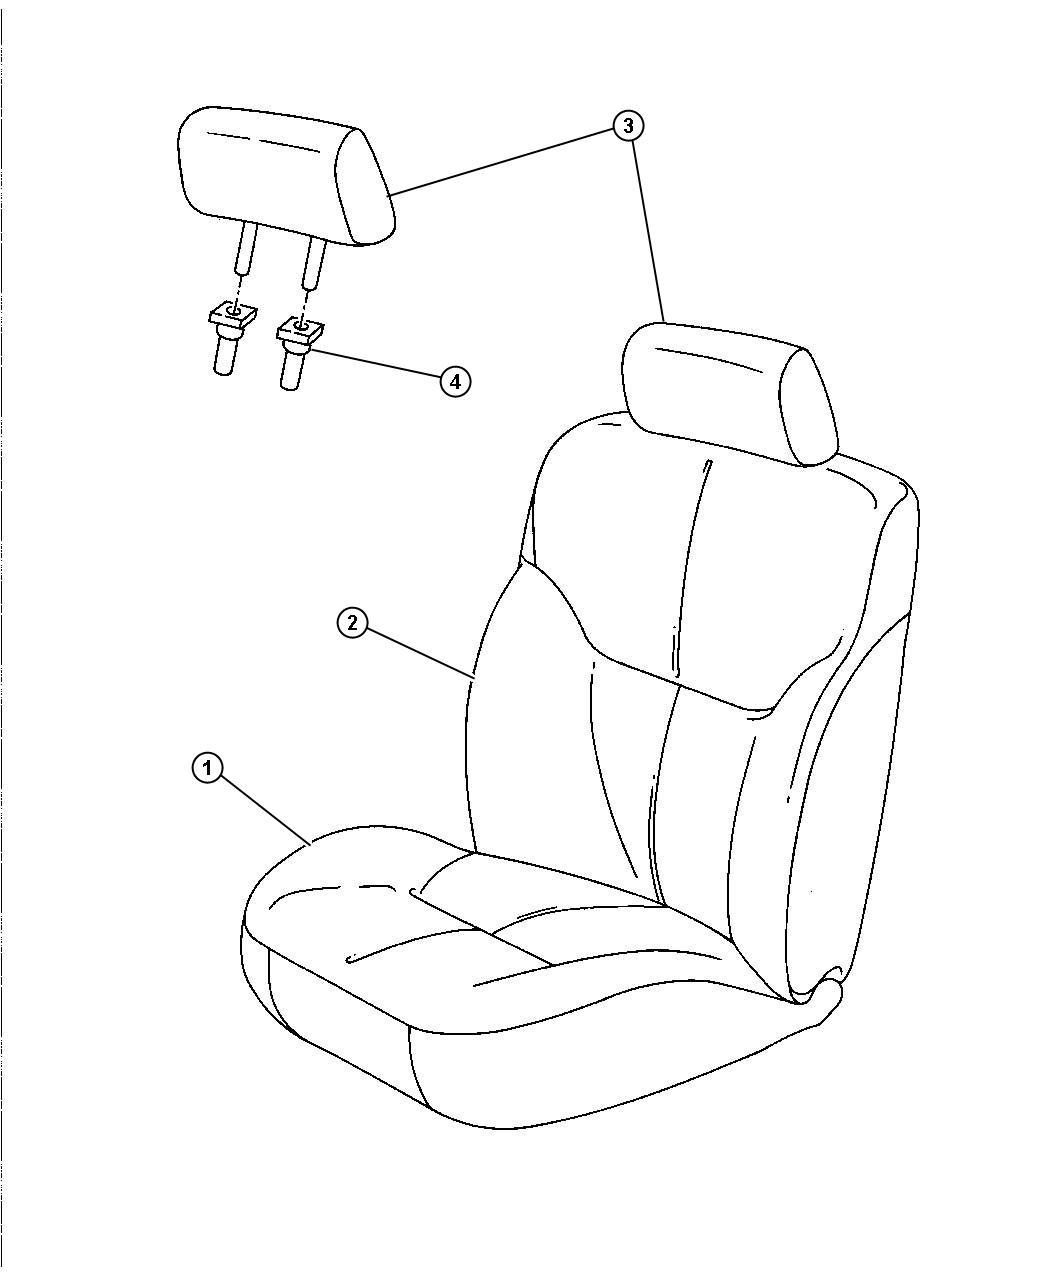 Dodge Stratus Headrest Front L5 Trim Seat